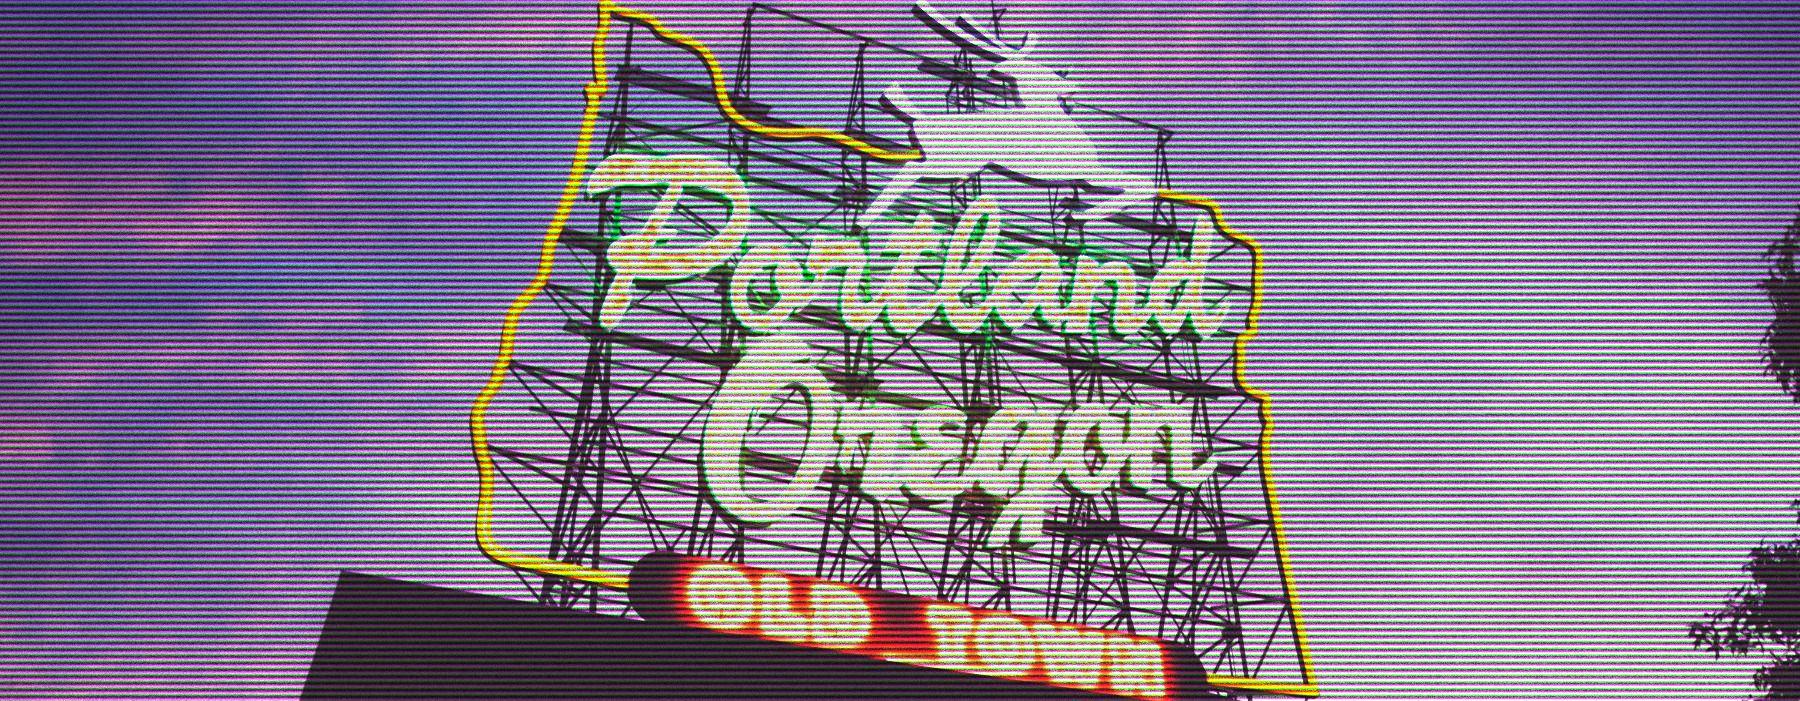 Portland/Zack Spear